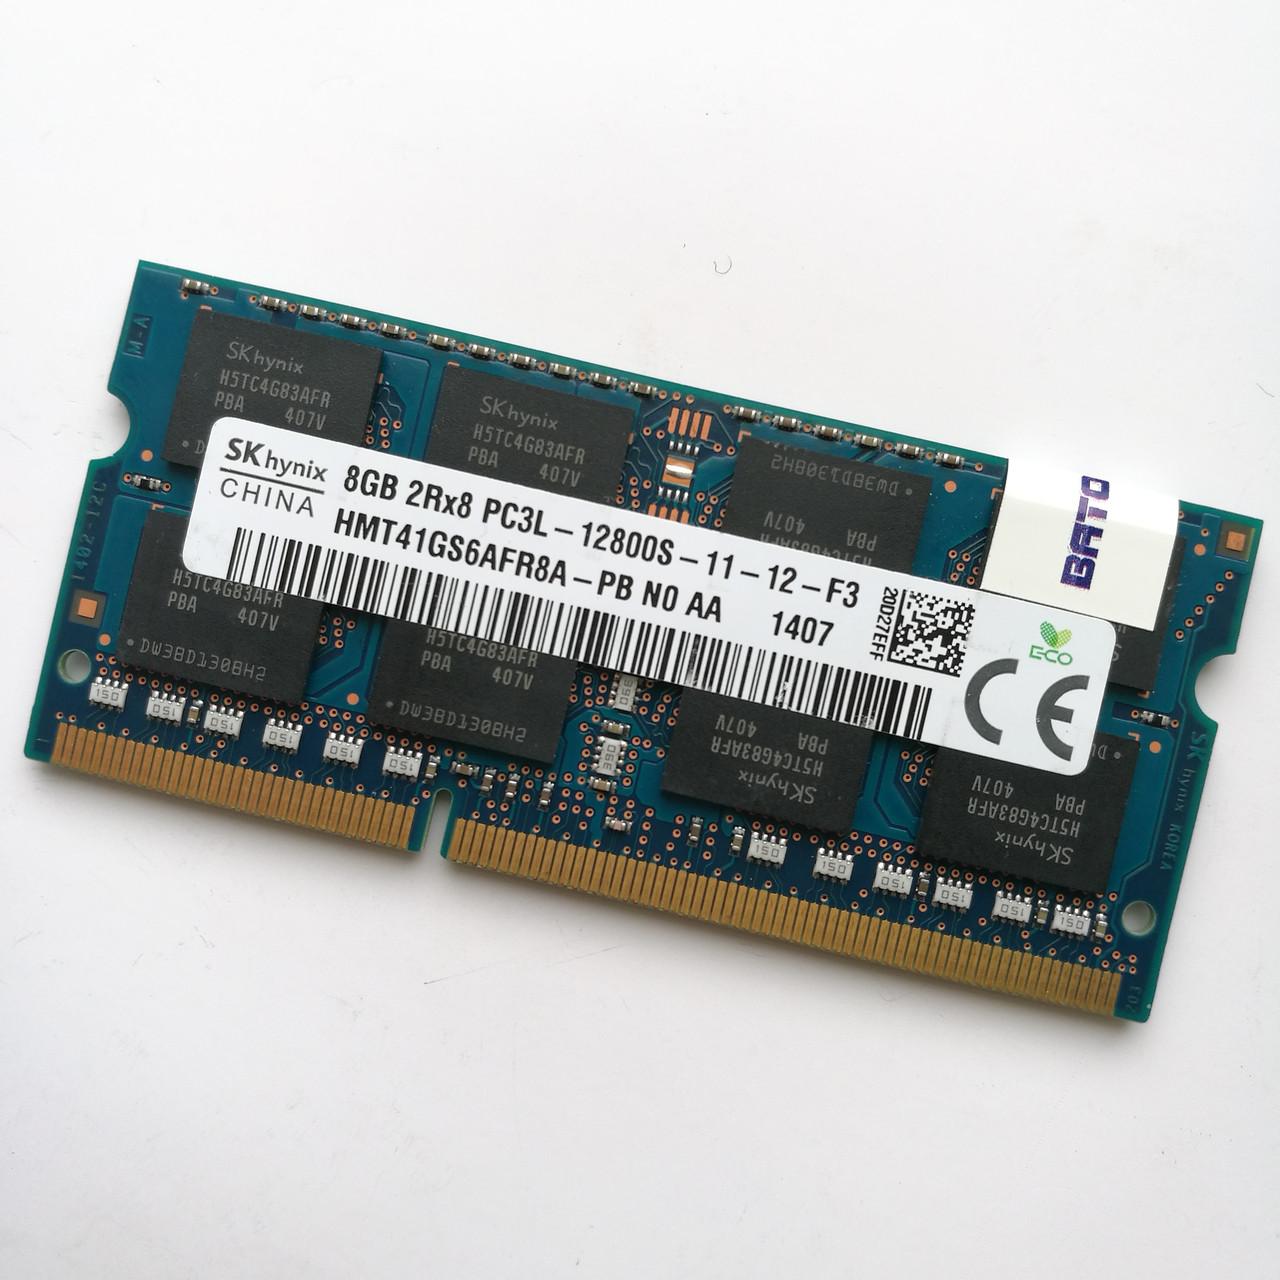 Оперативная память для ноутбука Hynix SODIMM DDR3L 8Gb 1600MHz 12800s CL11 (HMT41GS6AFR8A-PB N0 AA) Б/У